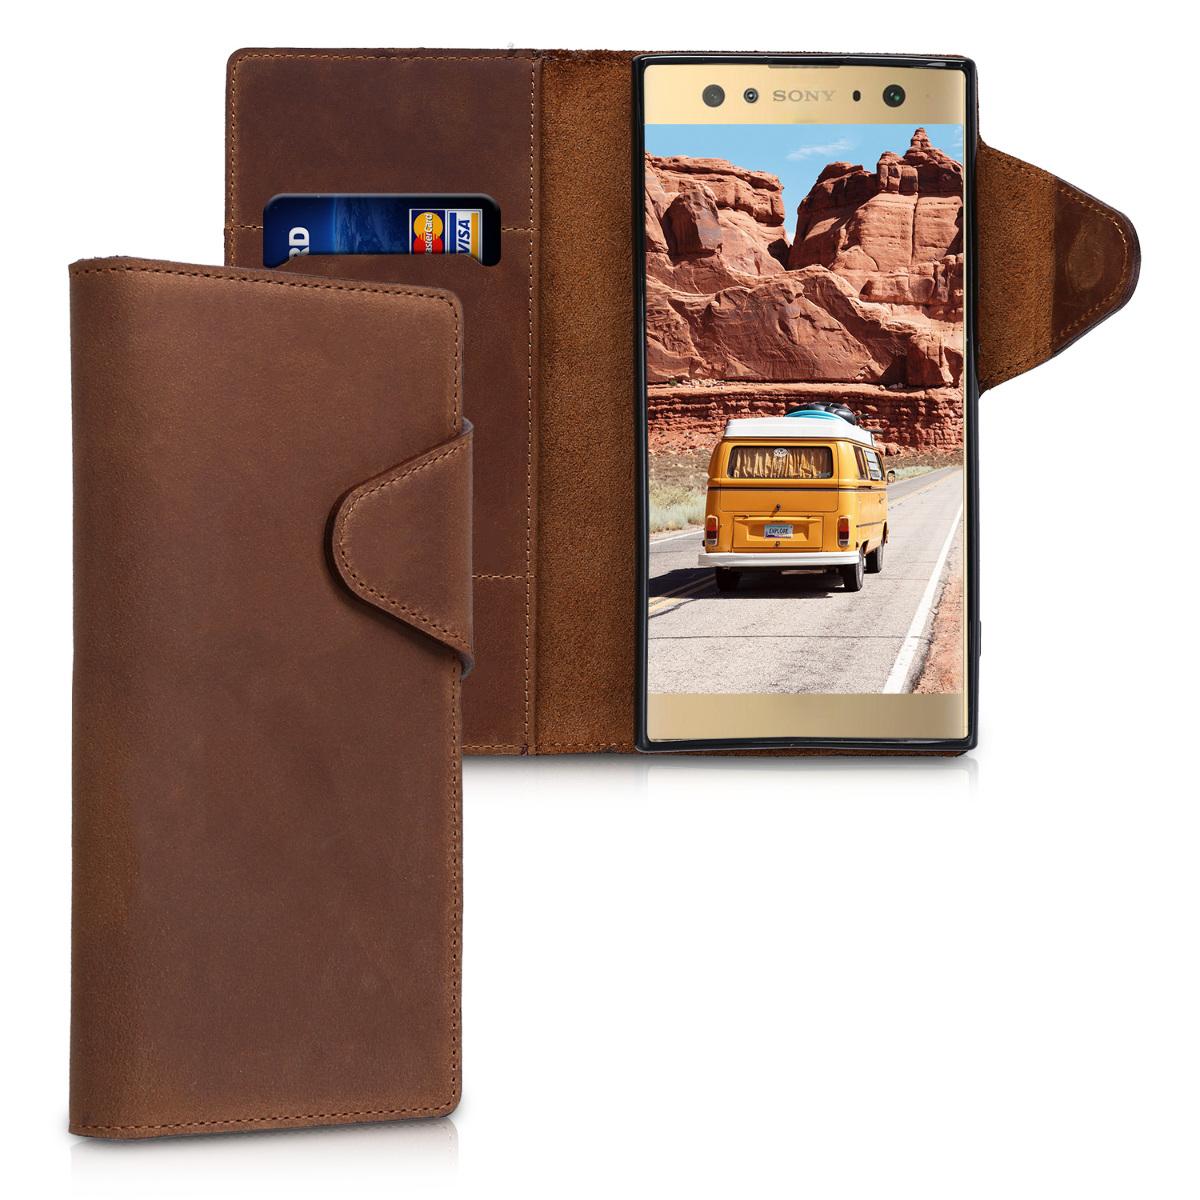 Kalibri Δερμάτινη Suede Θήκη - Πορτοφόλι Sony Xperia XA2 Ultra - Brown (44758.05)